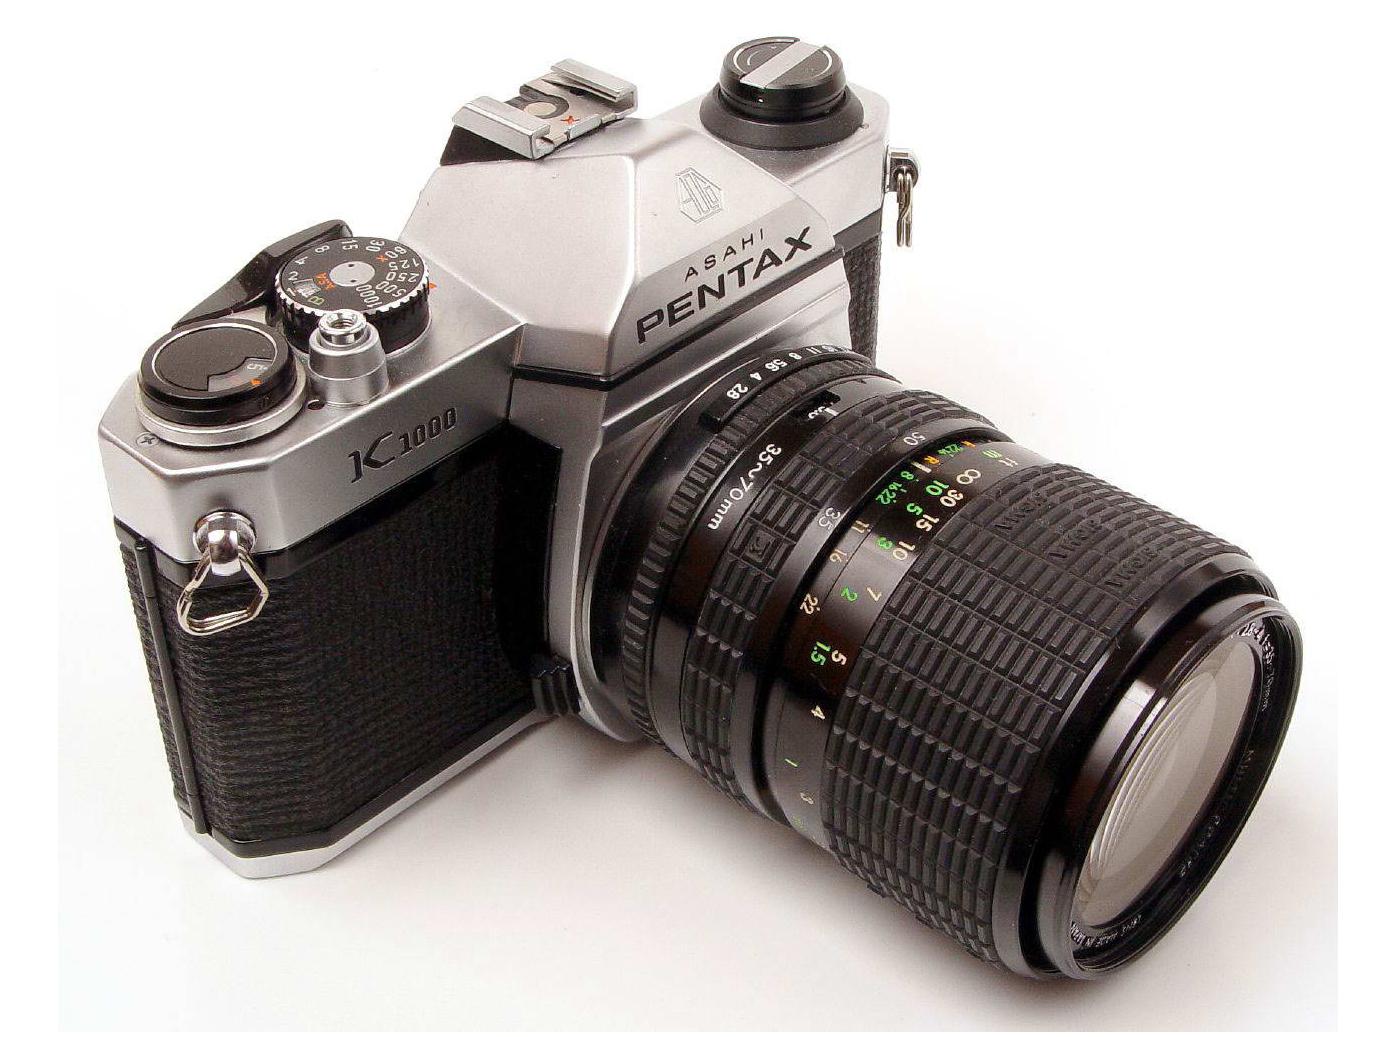 Leica s новая среднеформатная цифровая зеркальная камера в рамках #photokina